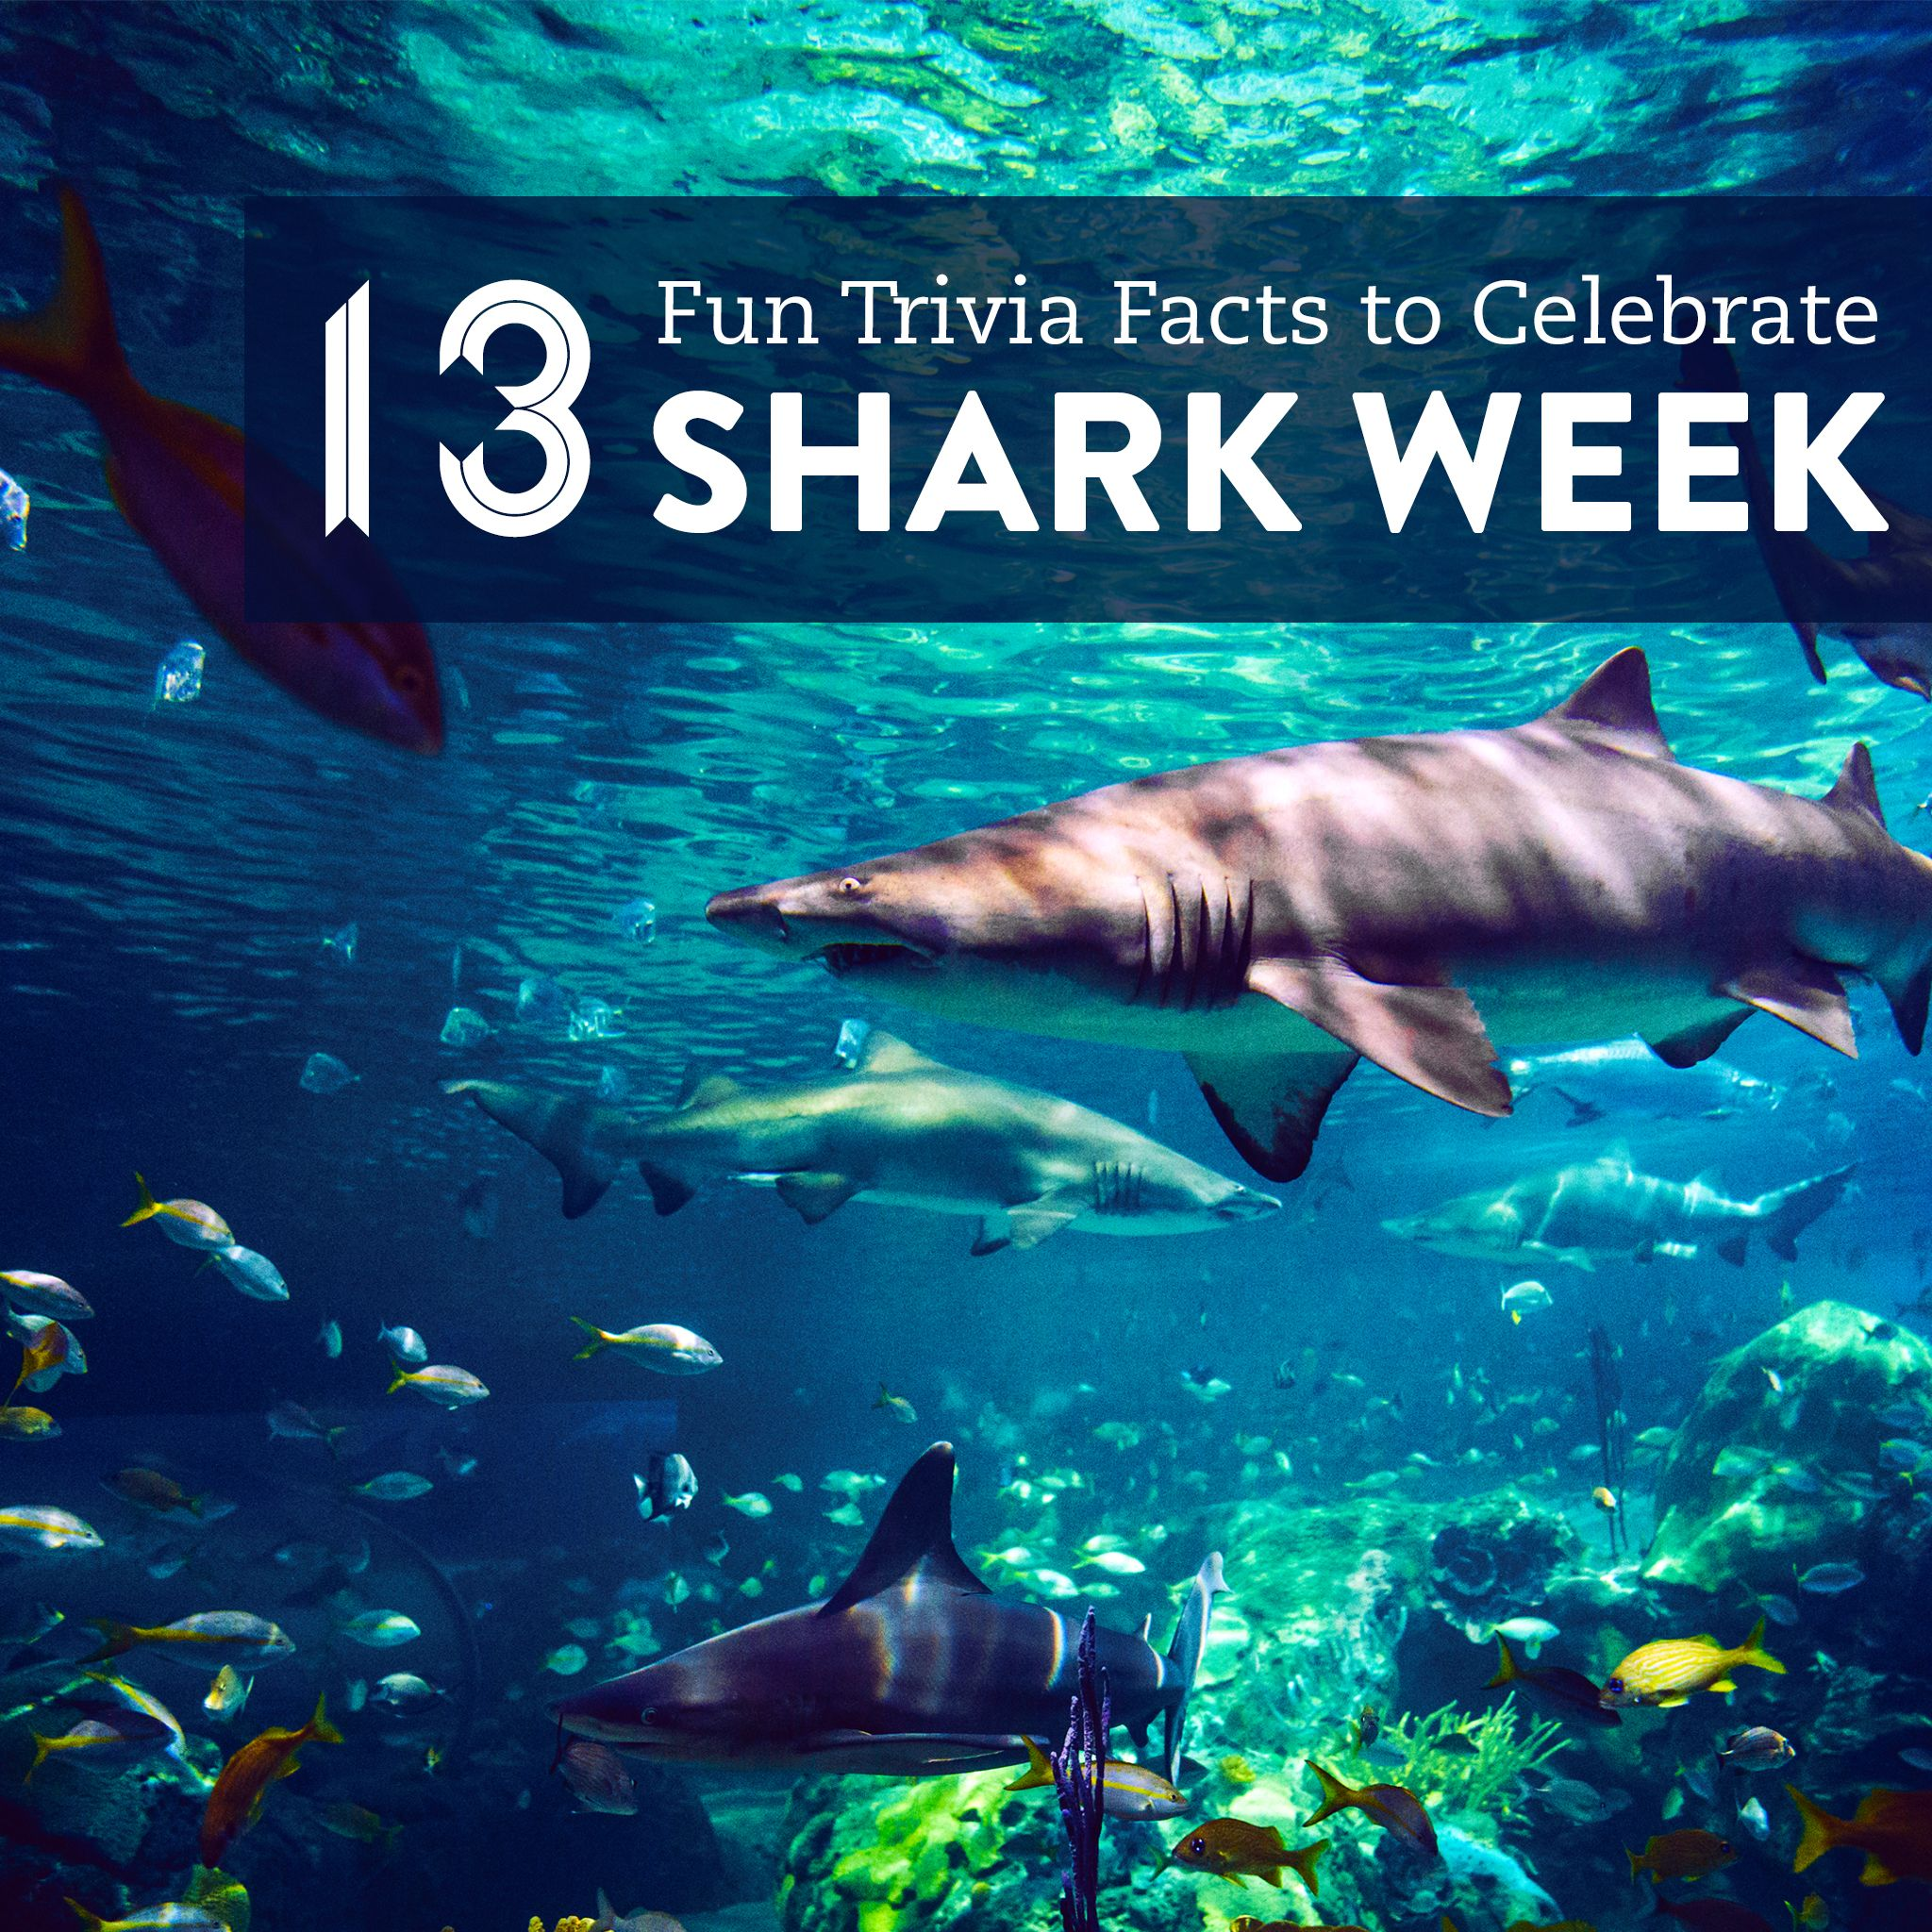 12 Fun Trivia Facts To Celebrate Shark Week